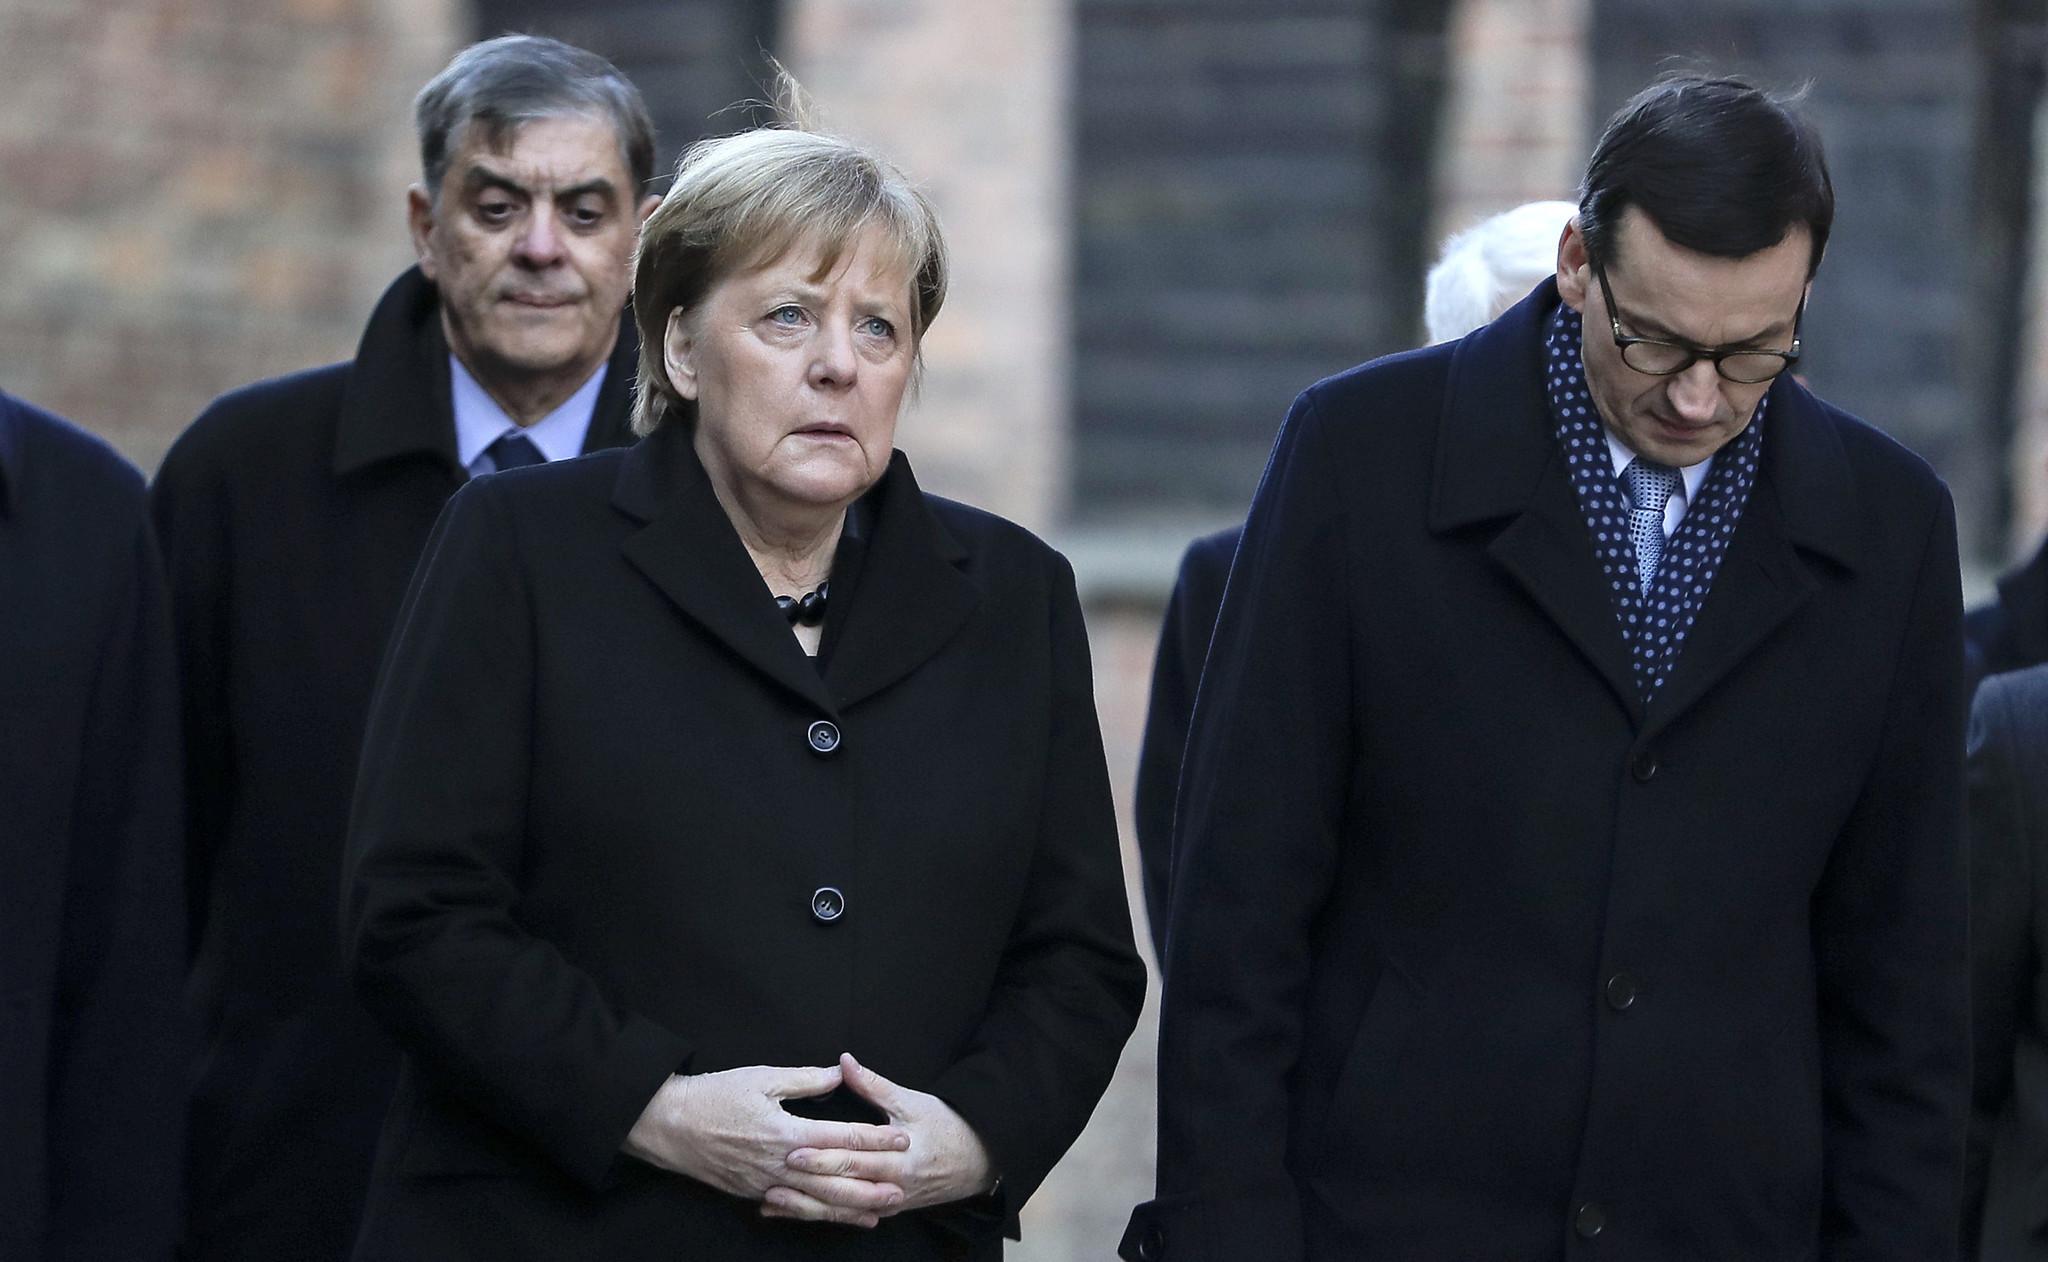 German Chancellor Angela Merkel feels 'deep shame' during first Auschwitz visit